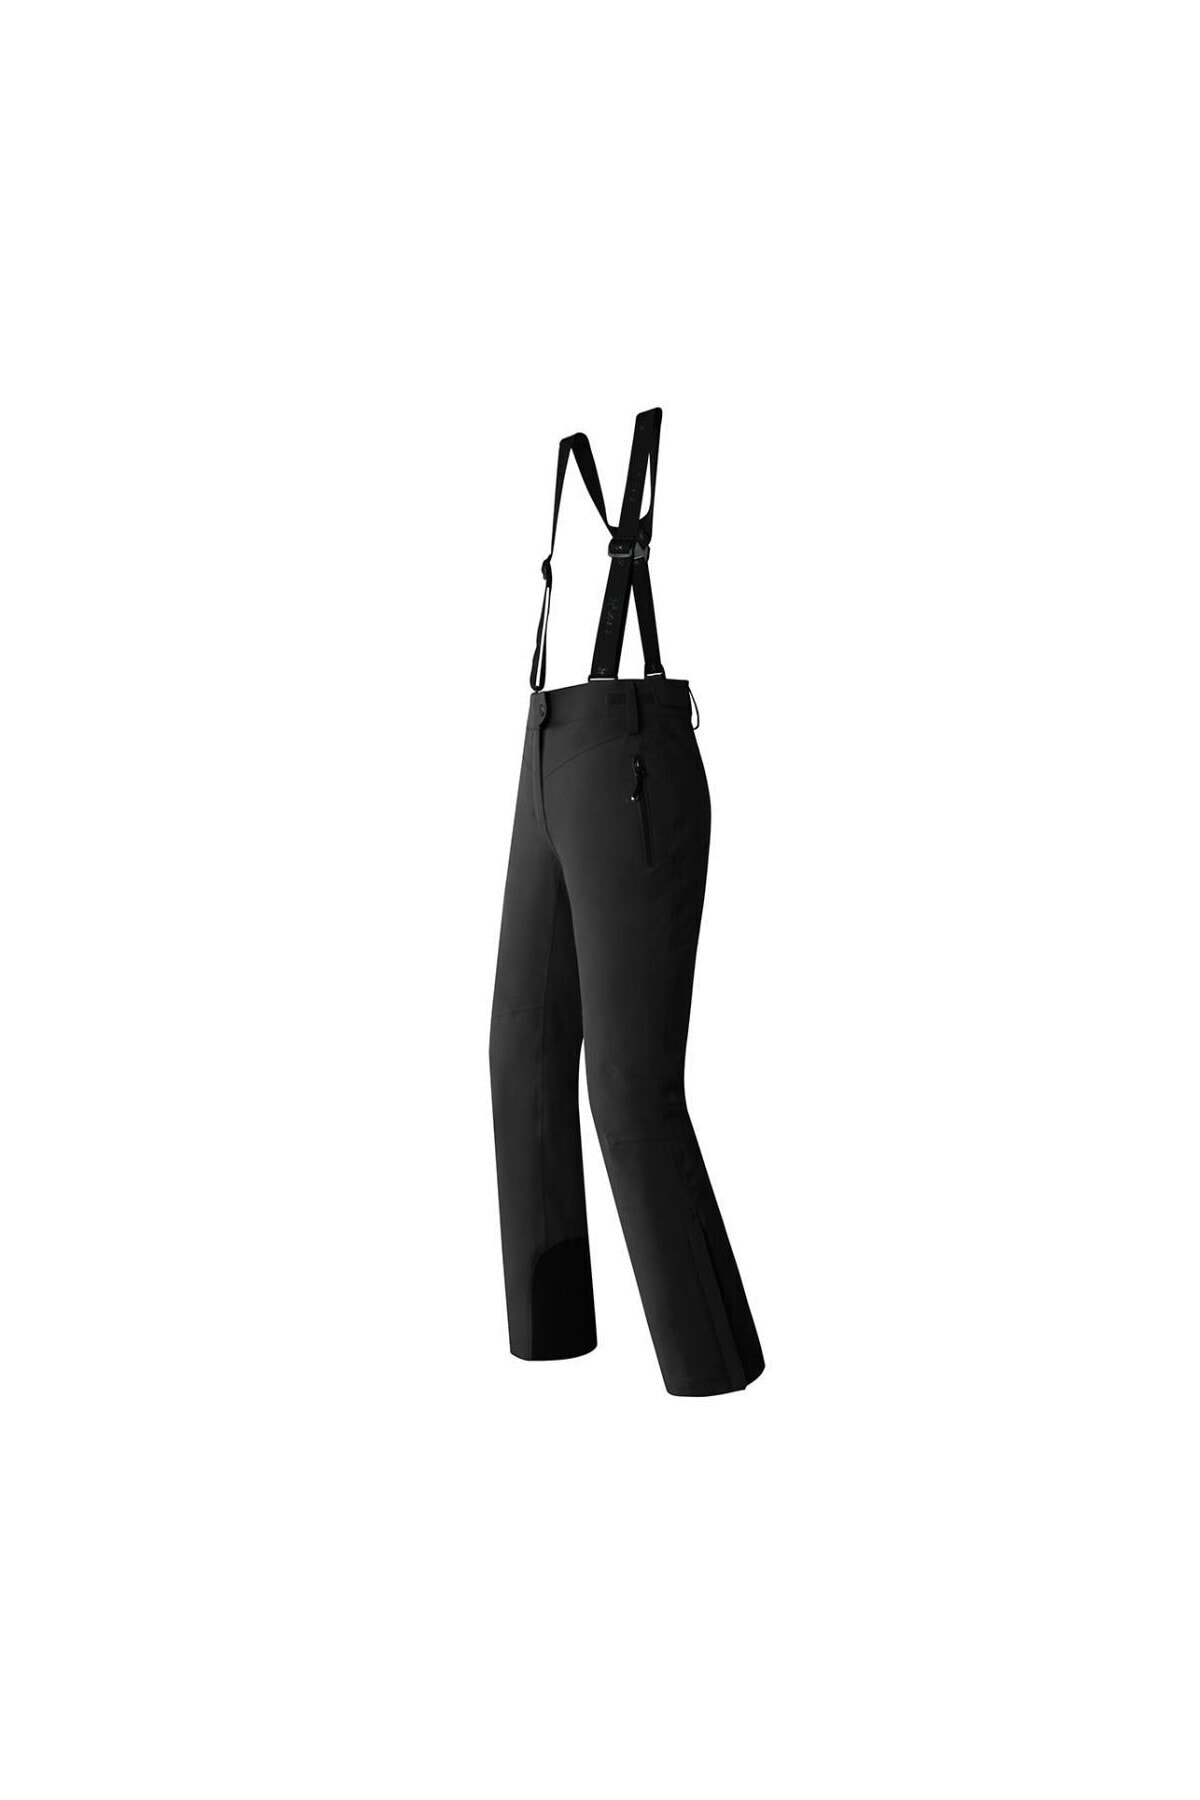 2AS Asama Kadın Kayak Pantalonu 1